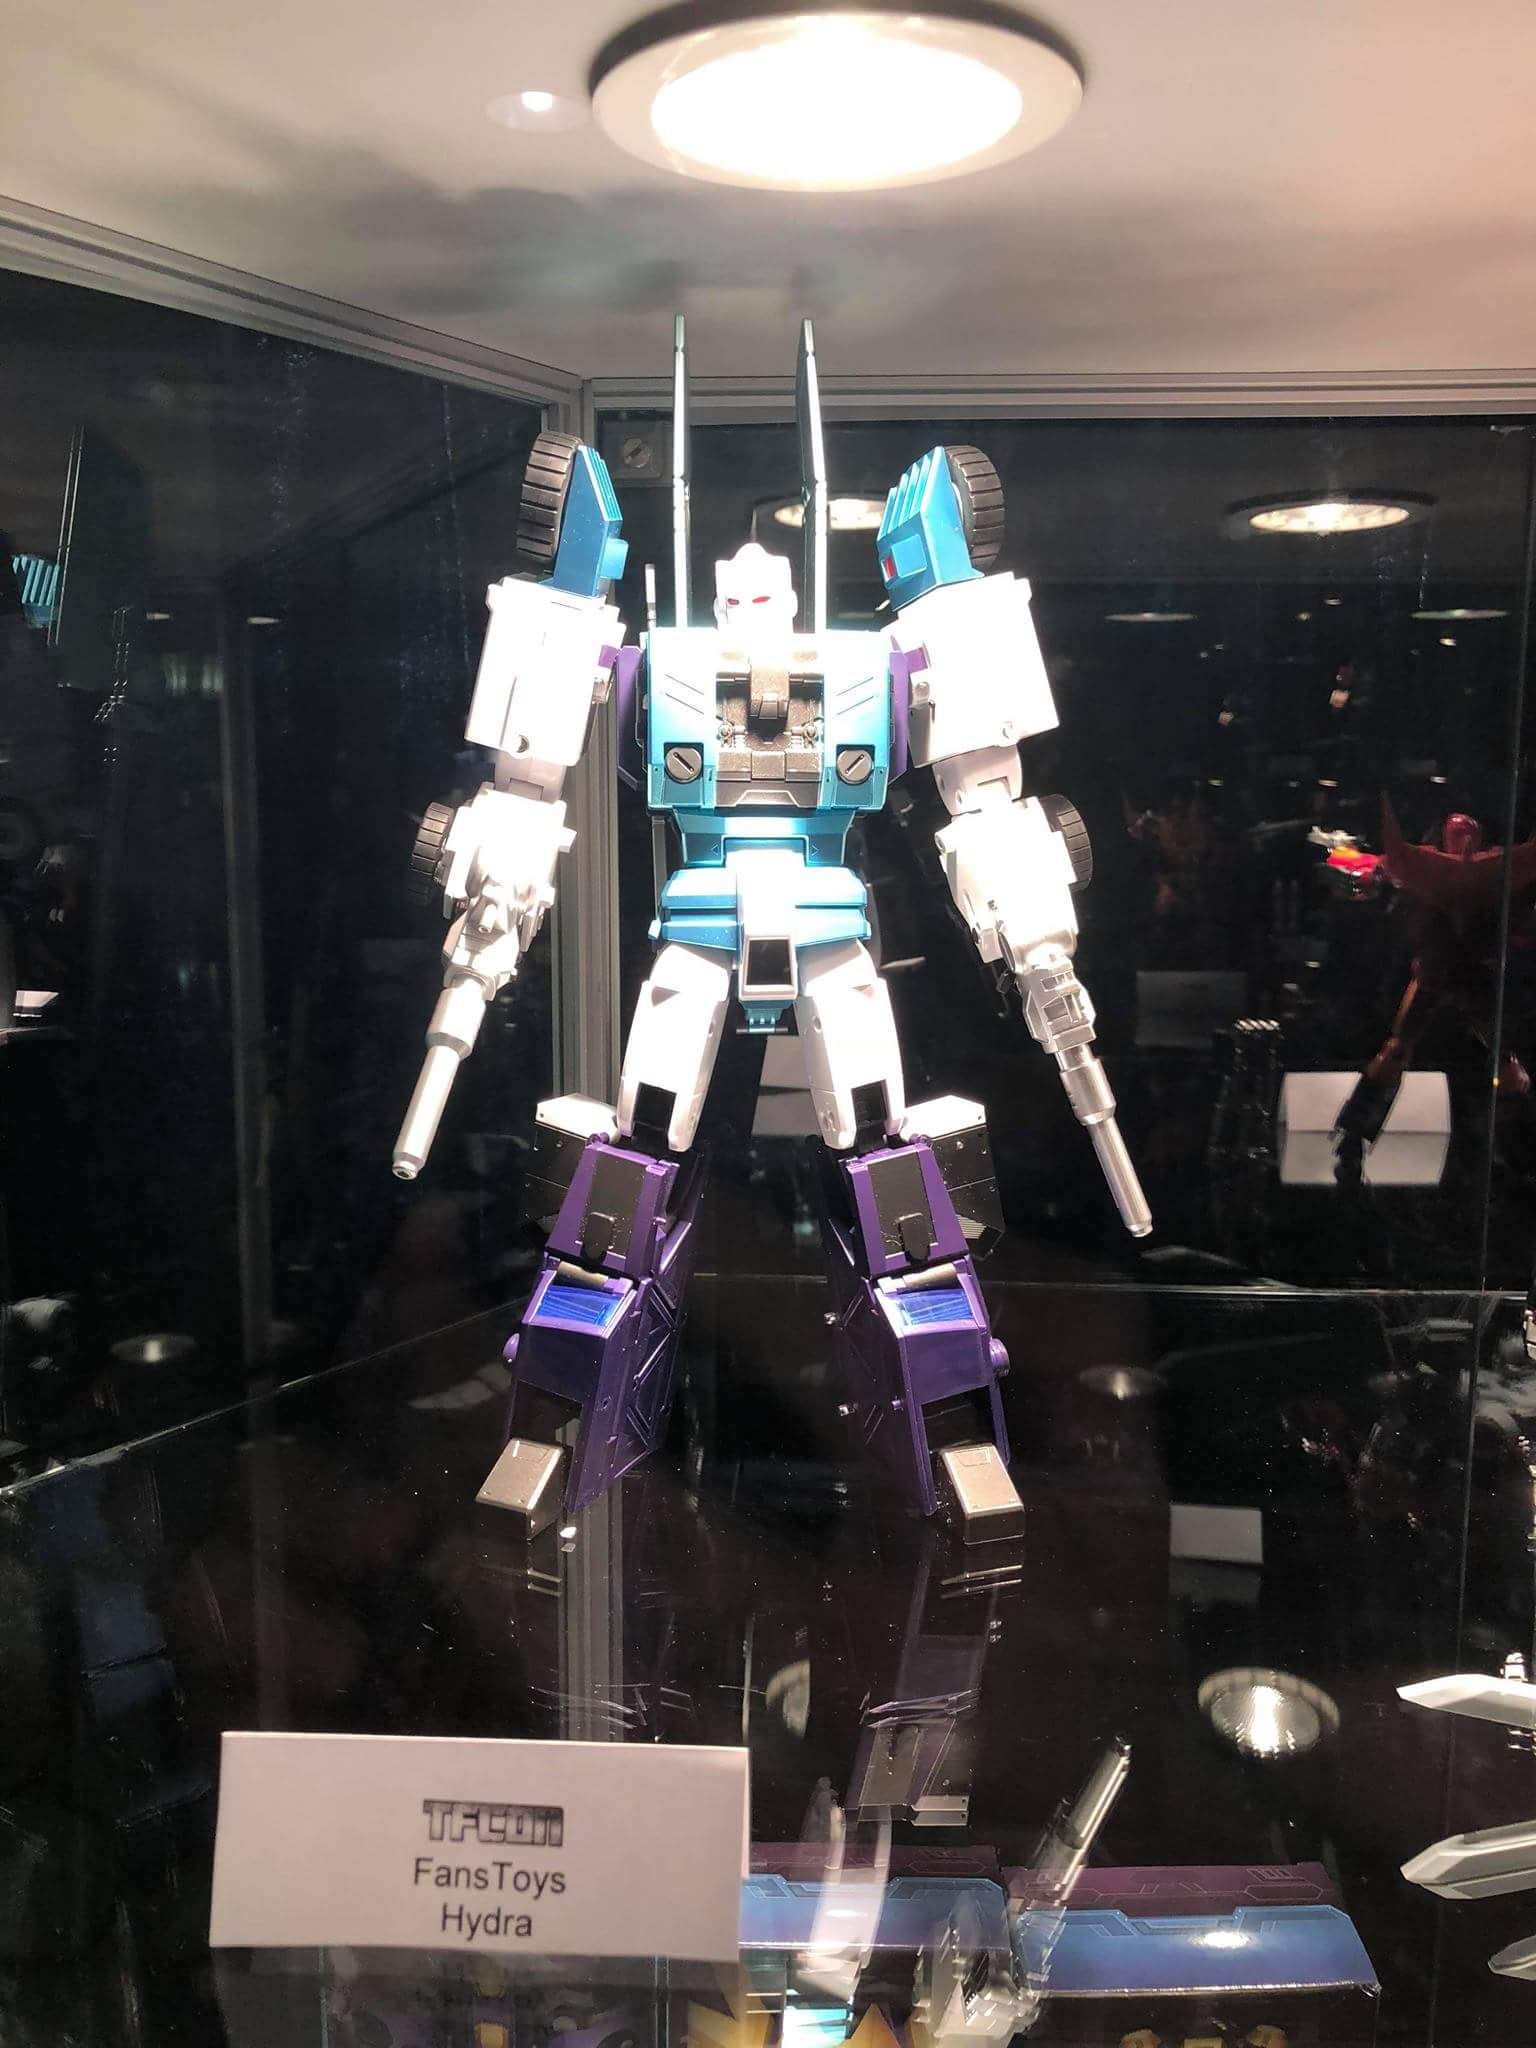 [Fanstoys] Produit Tiers - Jouet FT-28 Hydra aka Sixshot/Hexabot S2AYlTOg_o